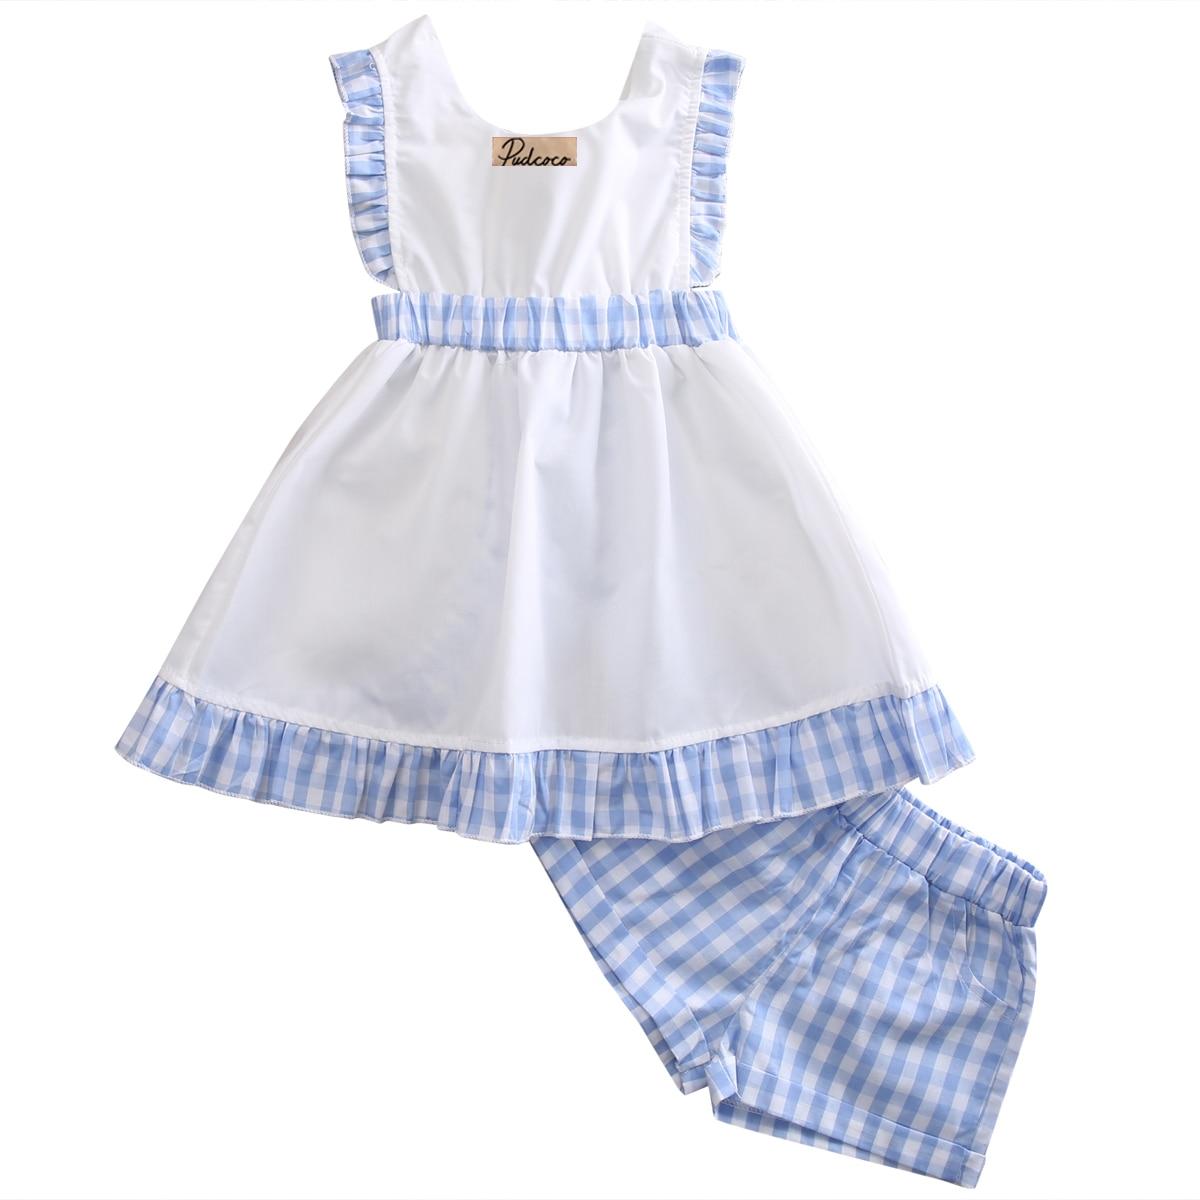 Casual Plaid O-Neck Toddler Kids Girls Sleeveless Plaid Sundress Shorts Summer Dress Outfits 2-7Yrs stylish long sleeve hooded with belt zip up women s padded coat